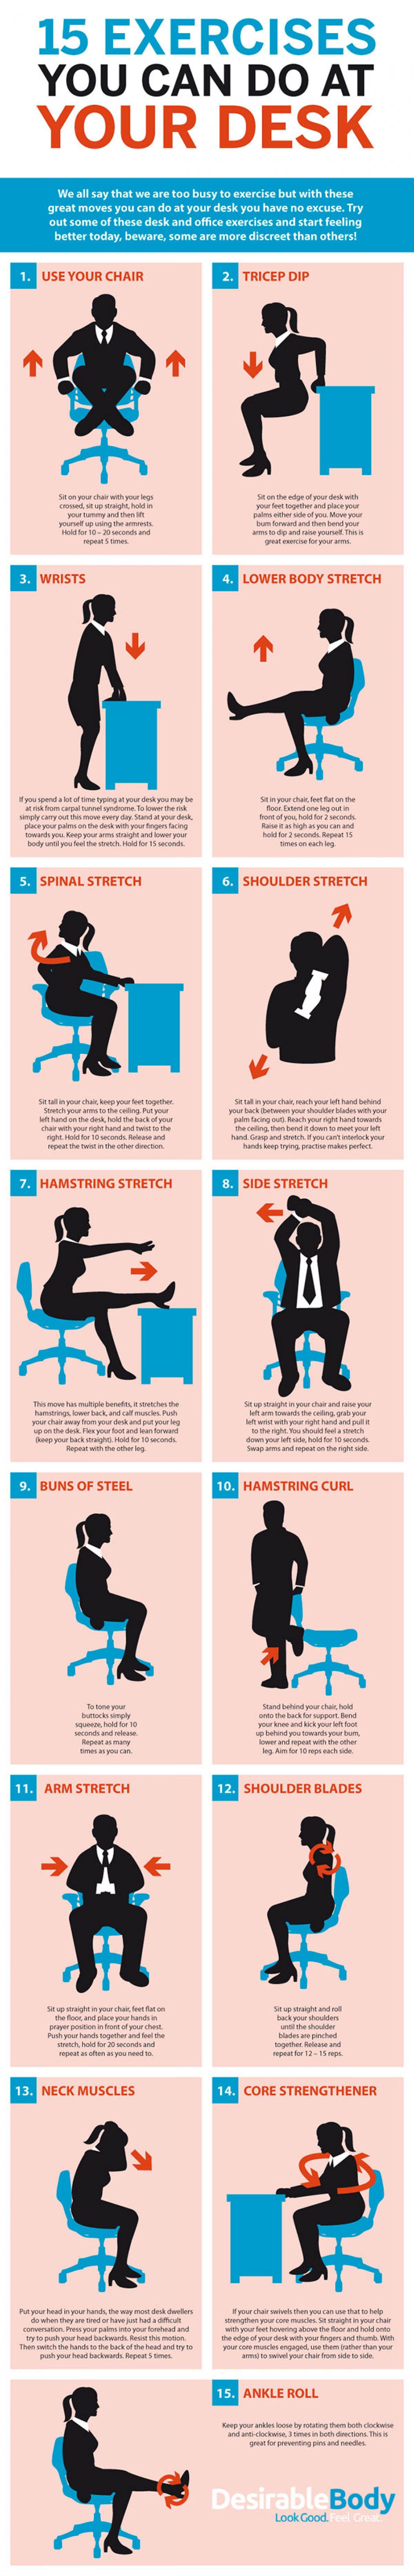 chair based exercises for legs